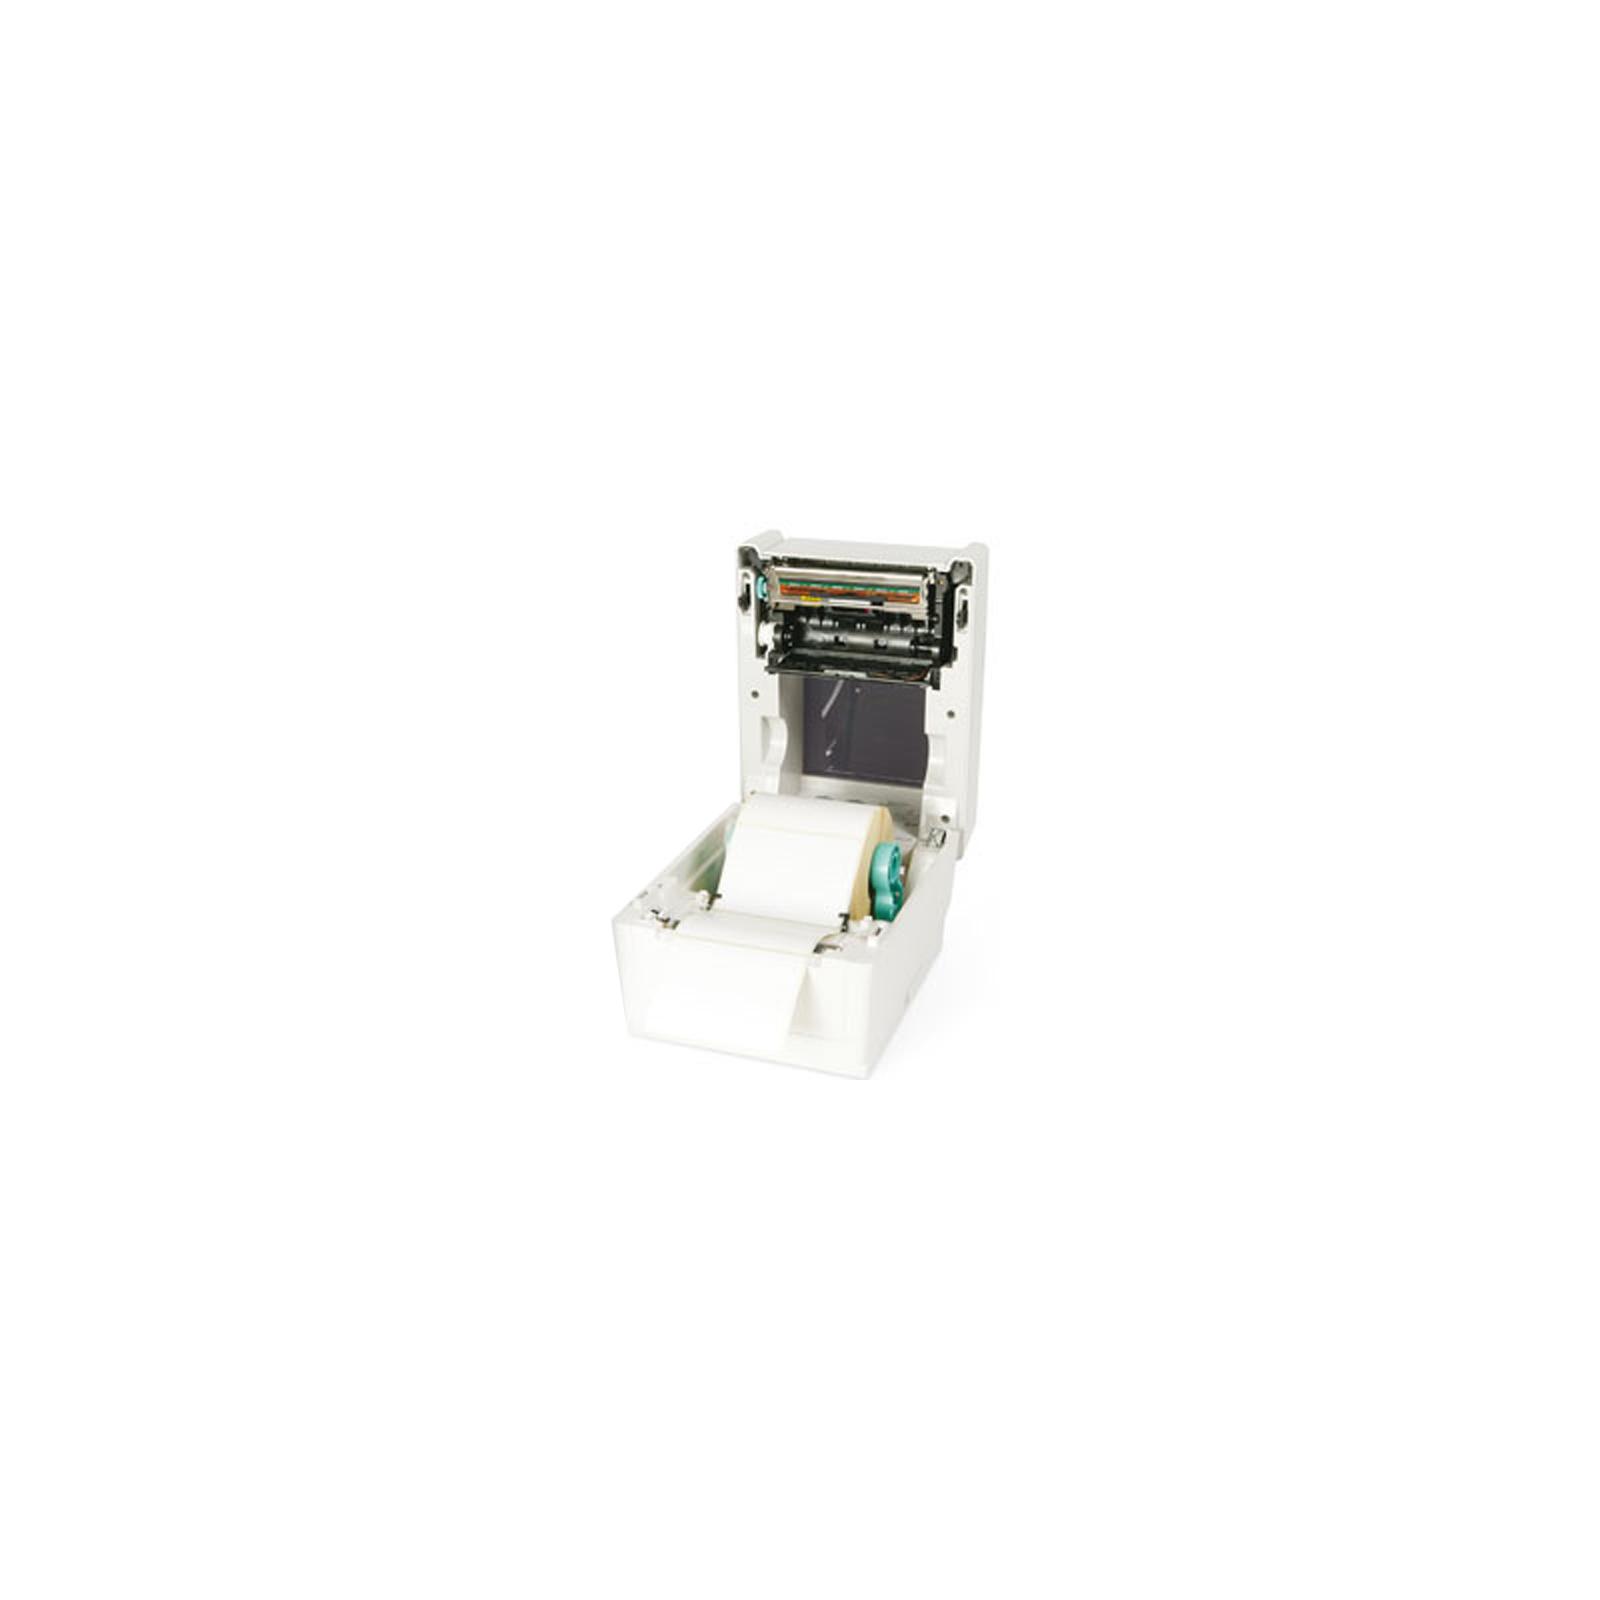 Принтер этикеток TOSHIBA B-EV4T-TS14-QM-R 300dpi (18221168714) изображение 2